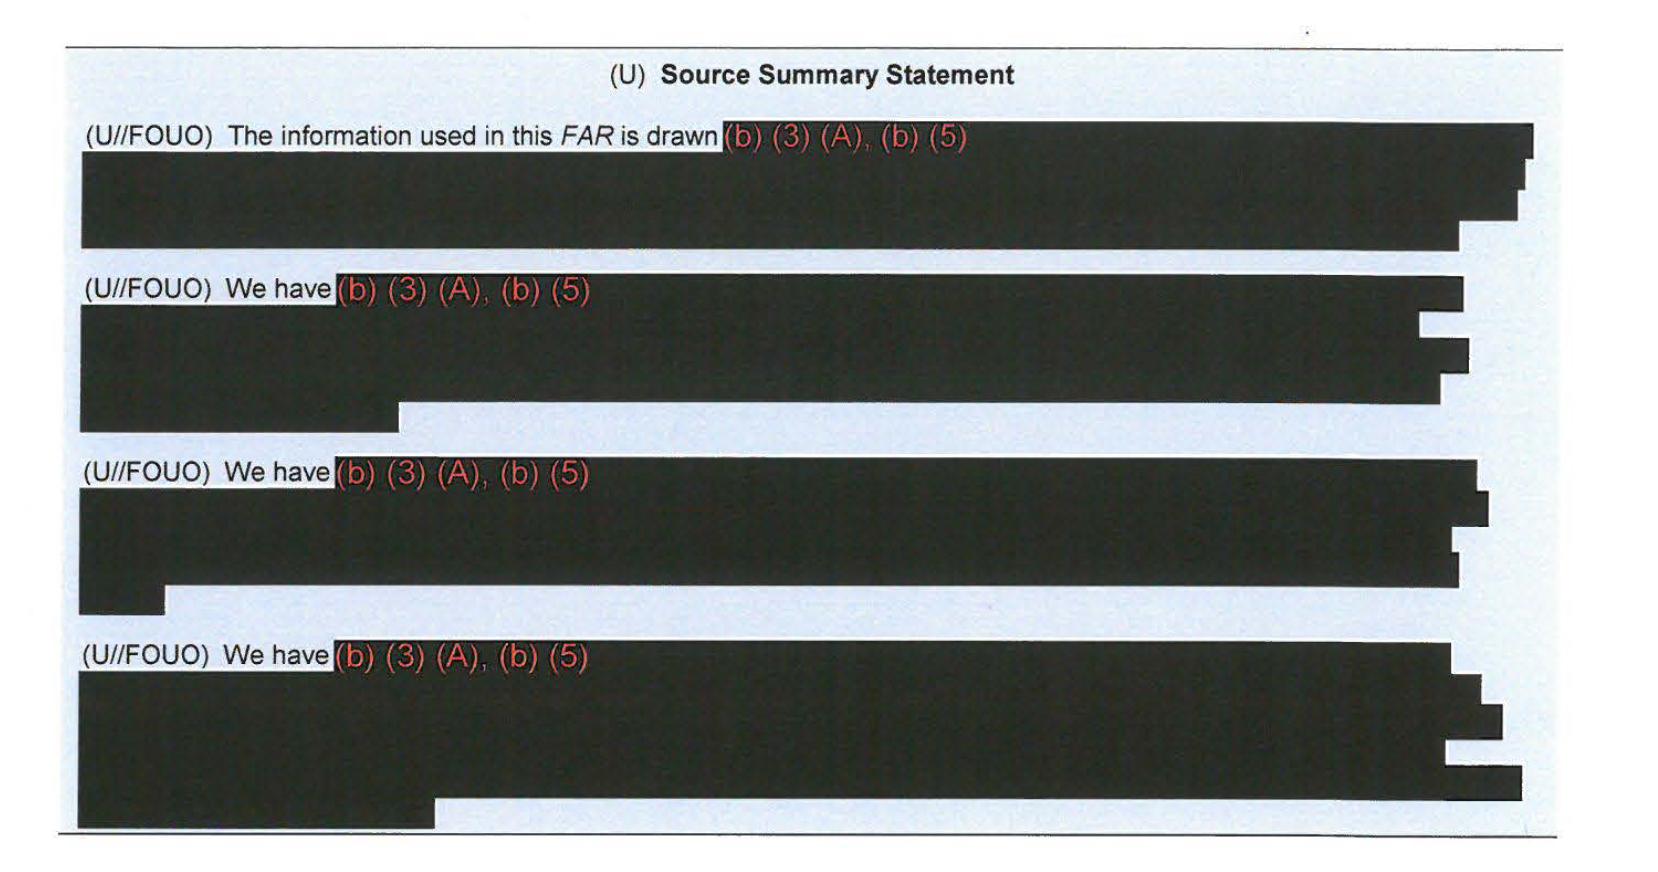 Screenshot of heavily redacted document